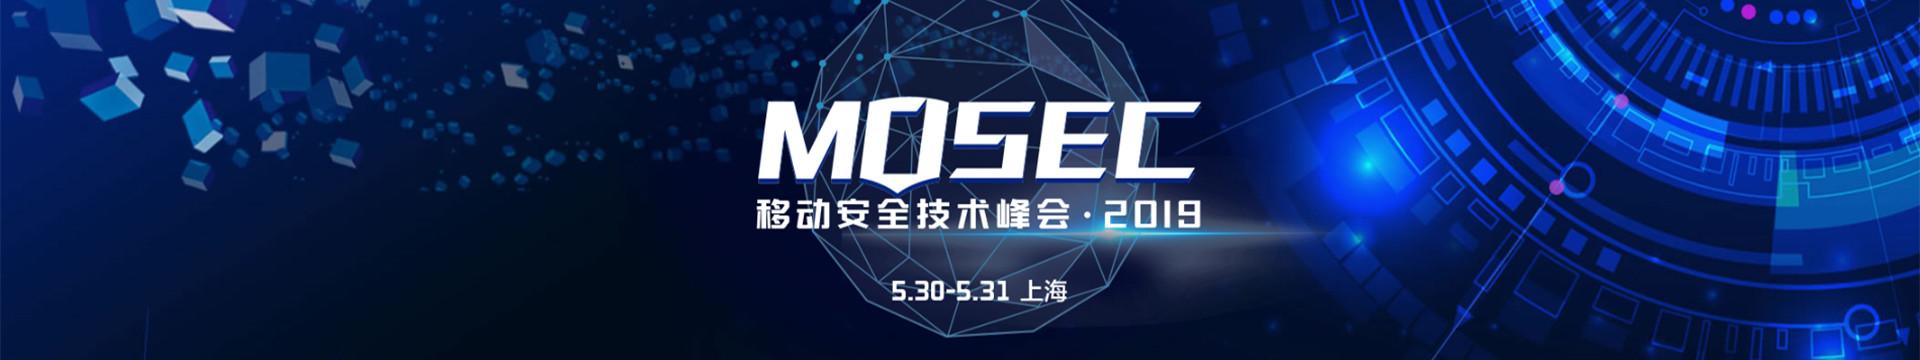 2019 MOSEC 移动安全技术峰会(上海)